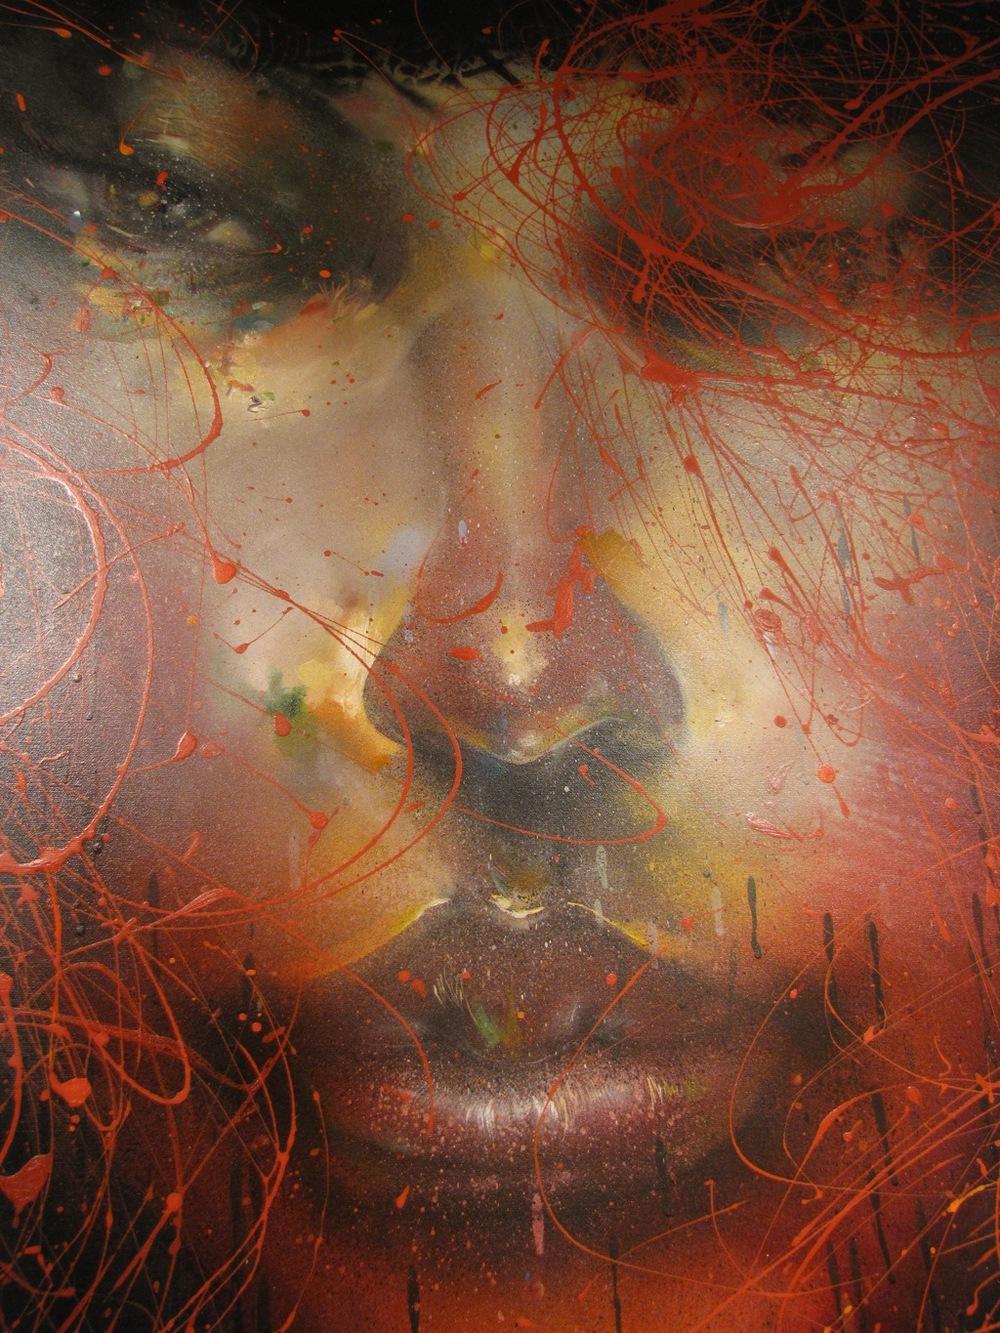 348-2010-david-character-assassination-37.jpg